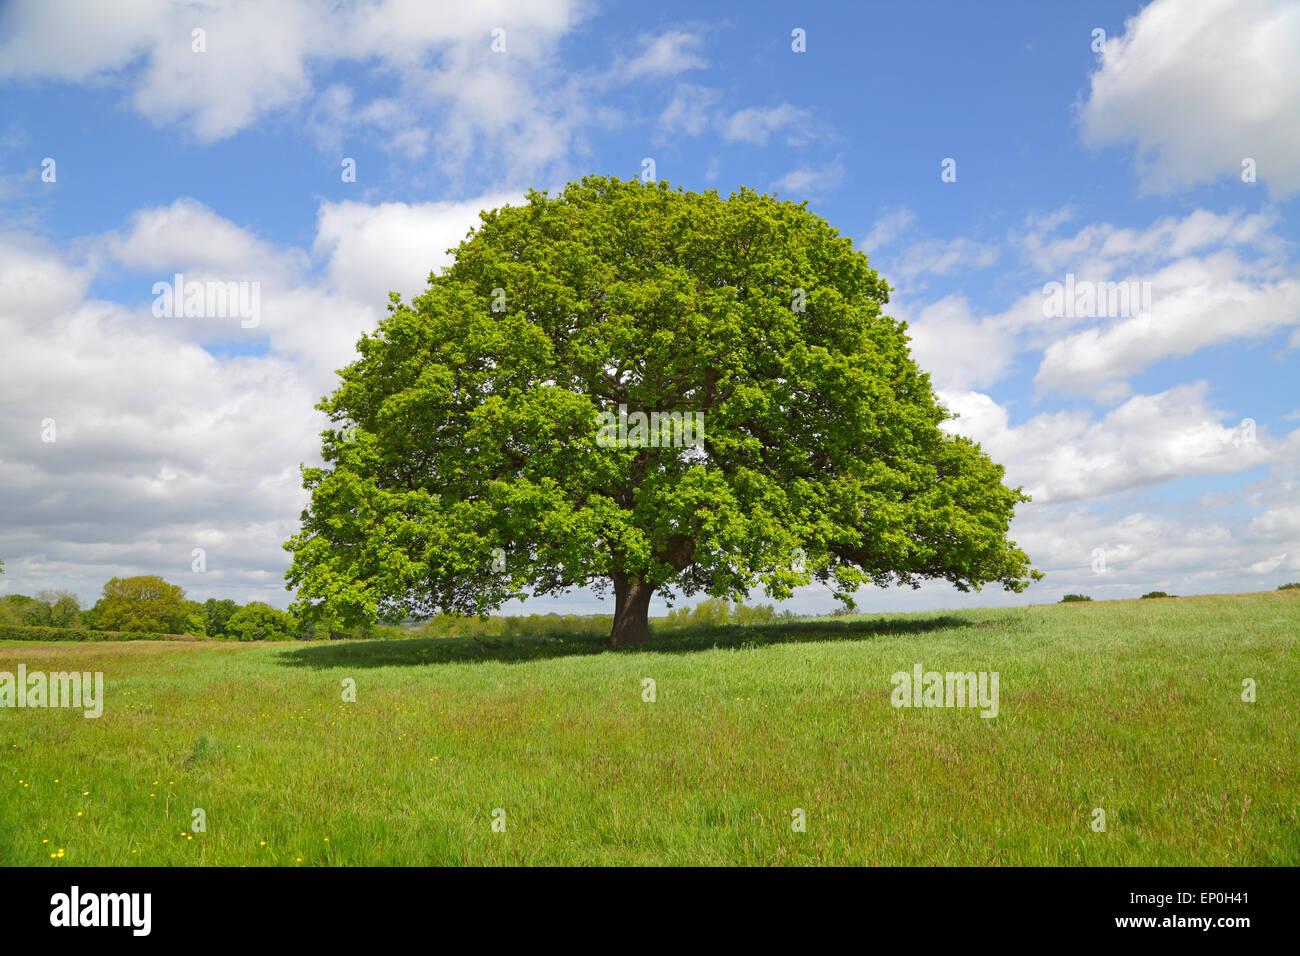 Oak Tree in spring, England, Britain, GB, UK - Stock Image